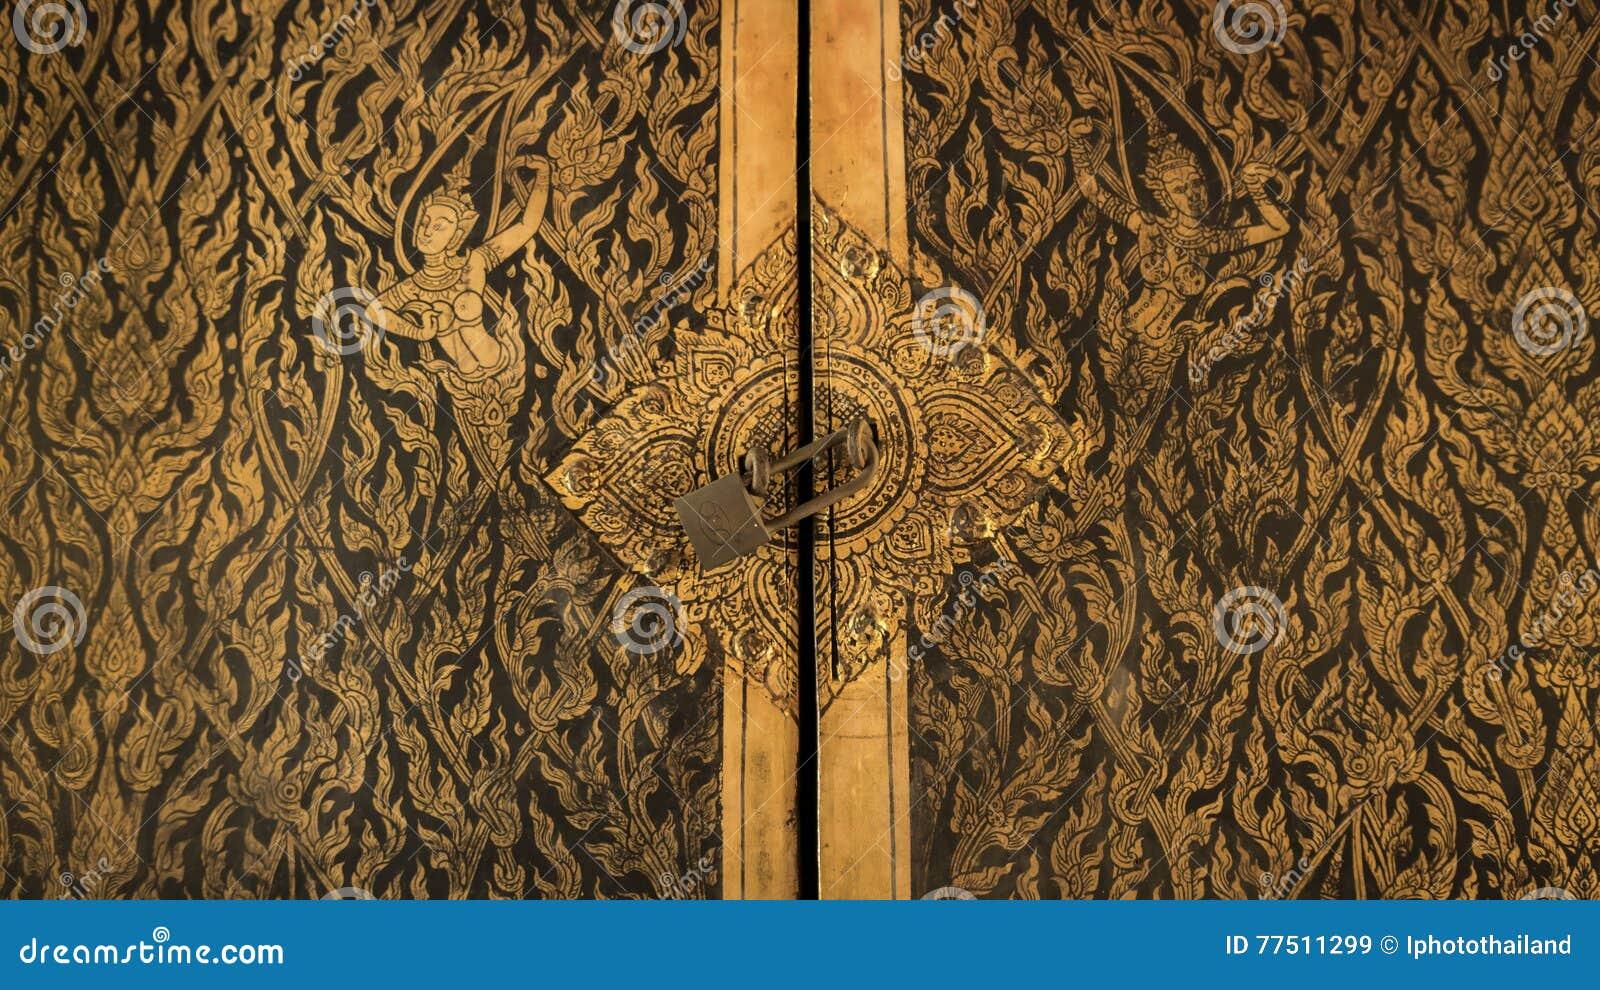 architecture bangkok door ... & Thai Door Art Architecture In Tripitaka Hall Wat Rakhang ... Pezcame.Com